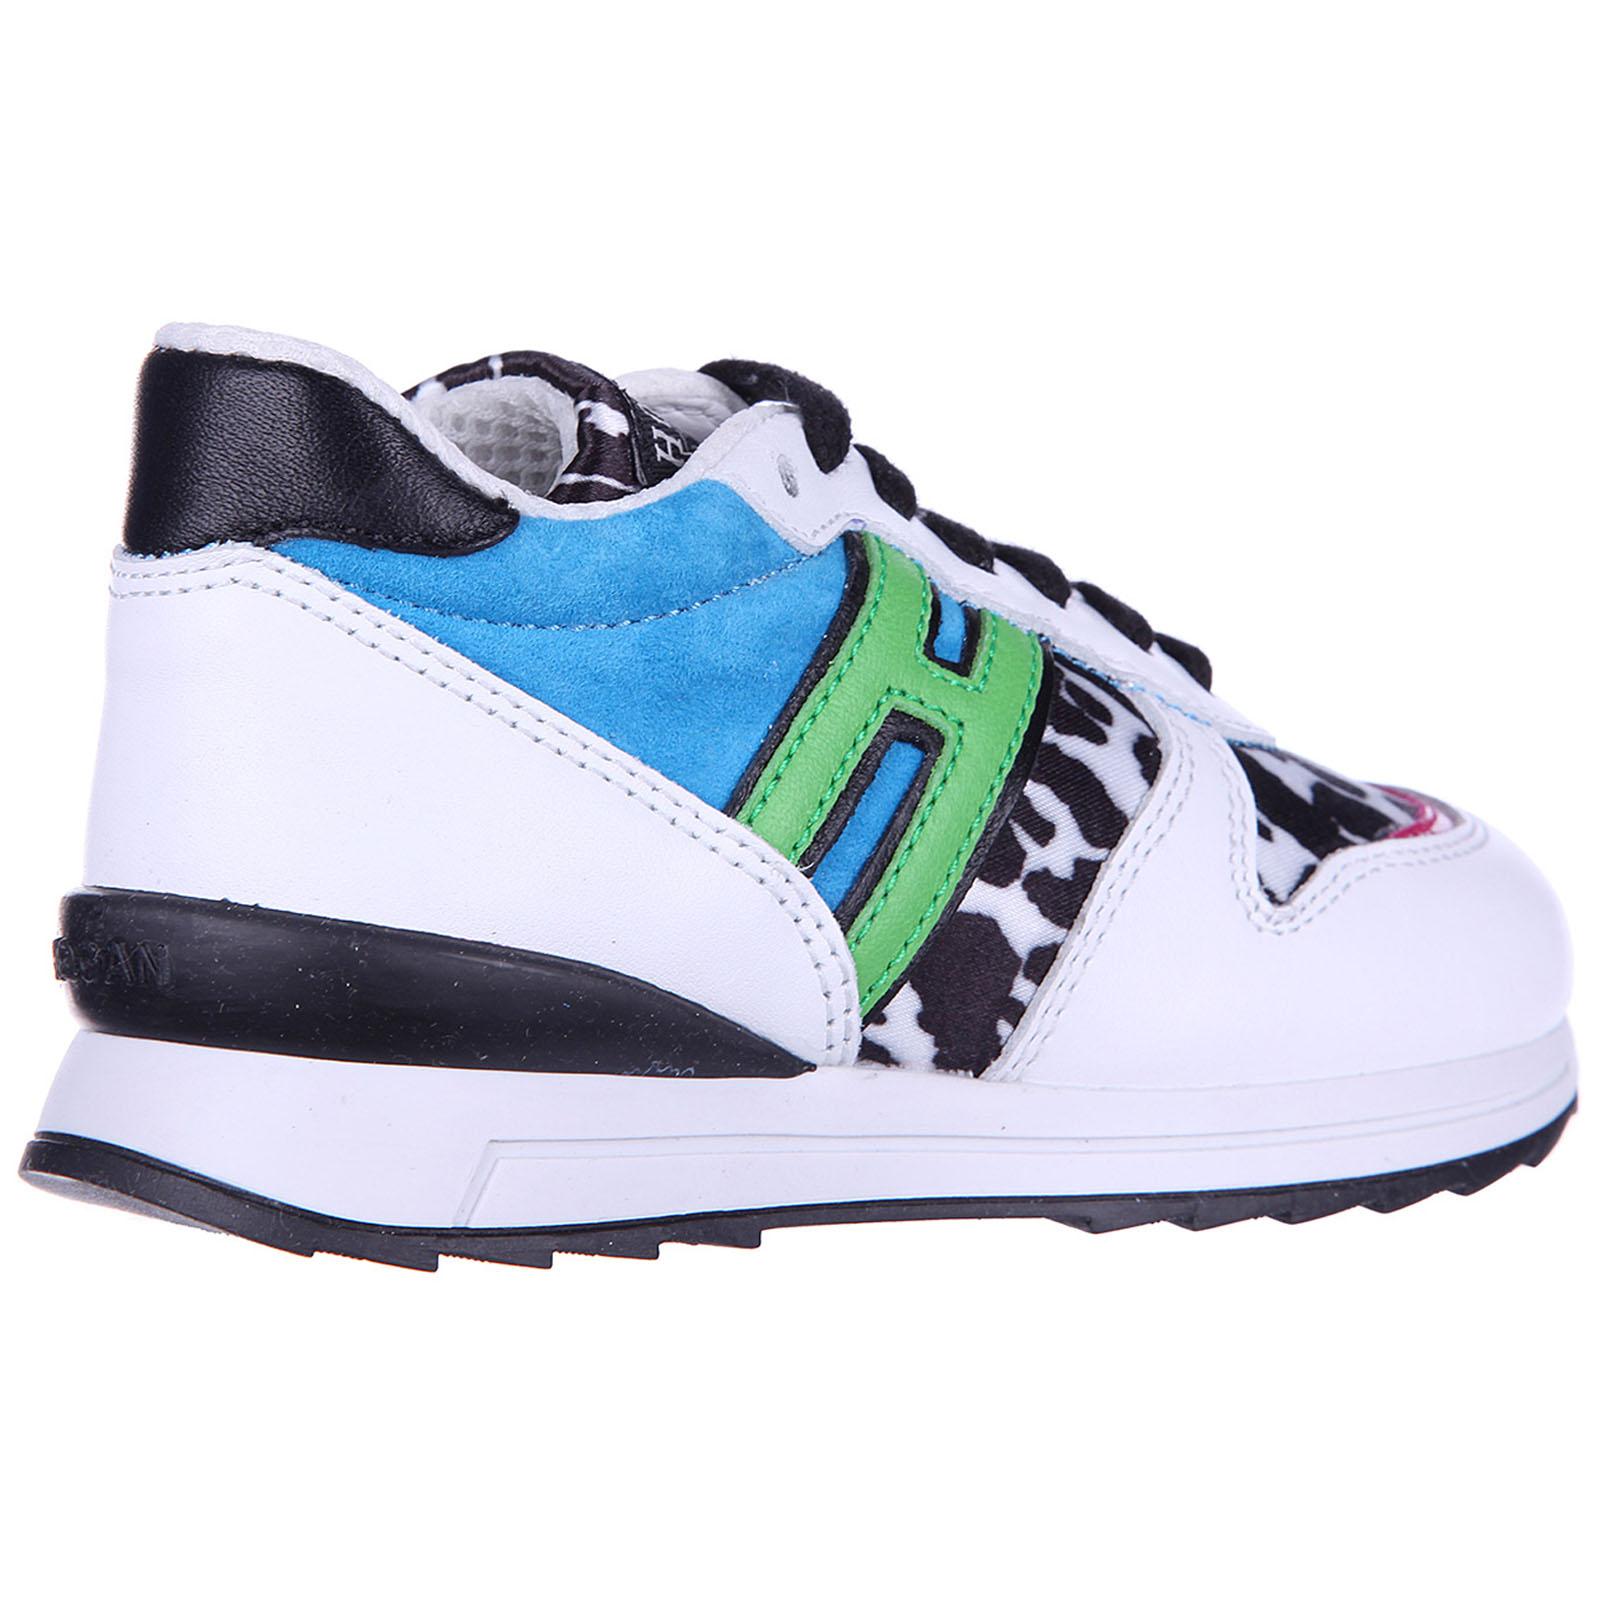 ... Scarpe sneakers bimba bambina pelle r 261 animalier zip rebel ... 3ef1445d320